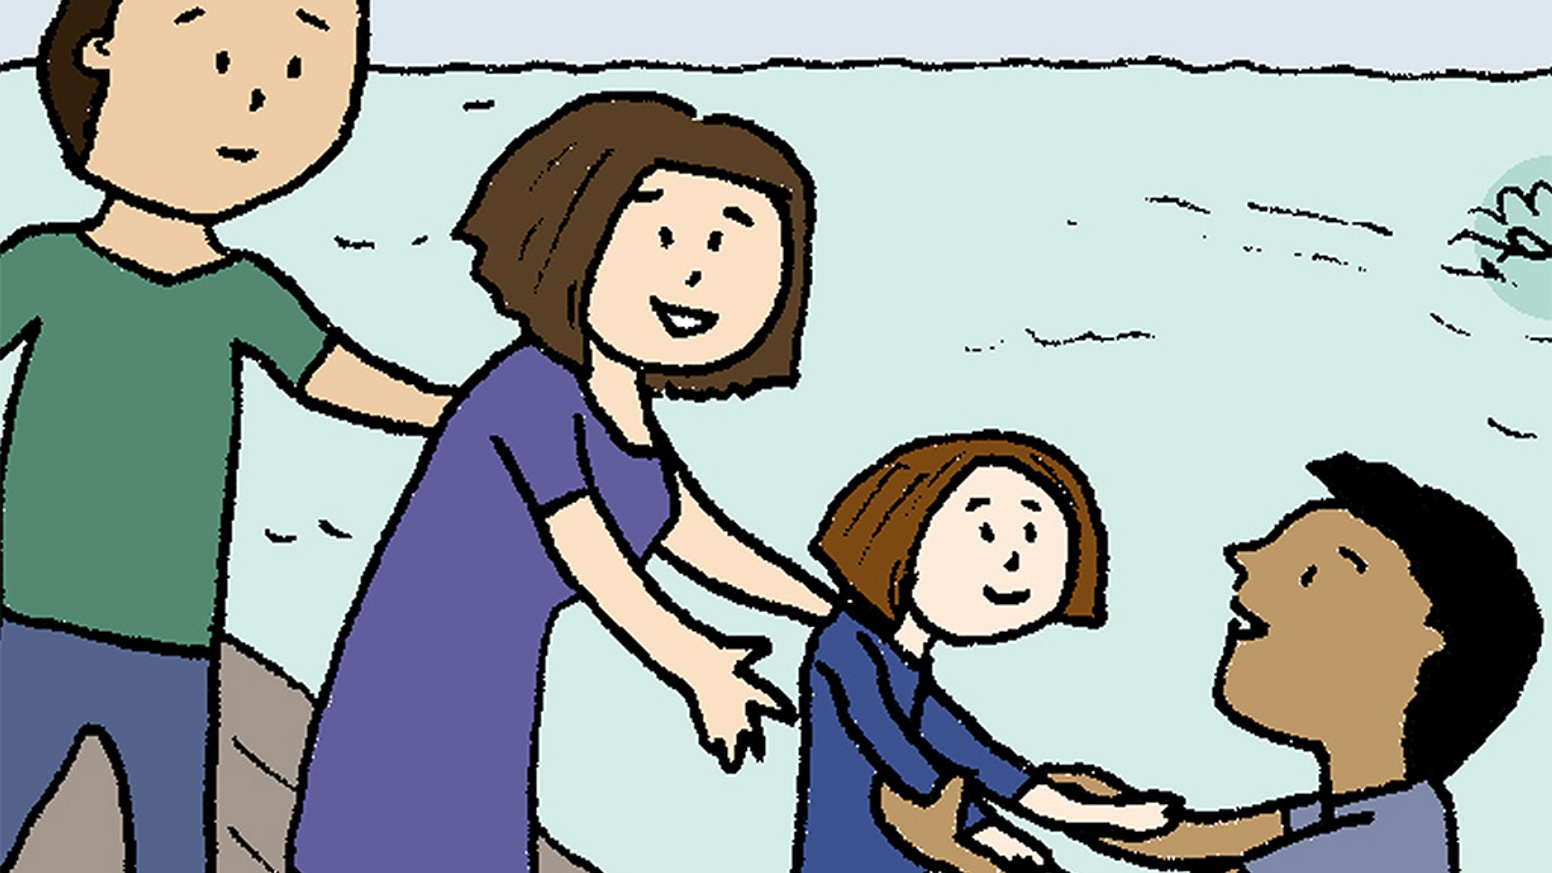 humanitarian cartoons by sphere project cartoon movement kickstarter